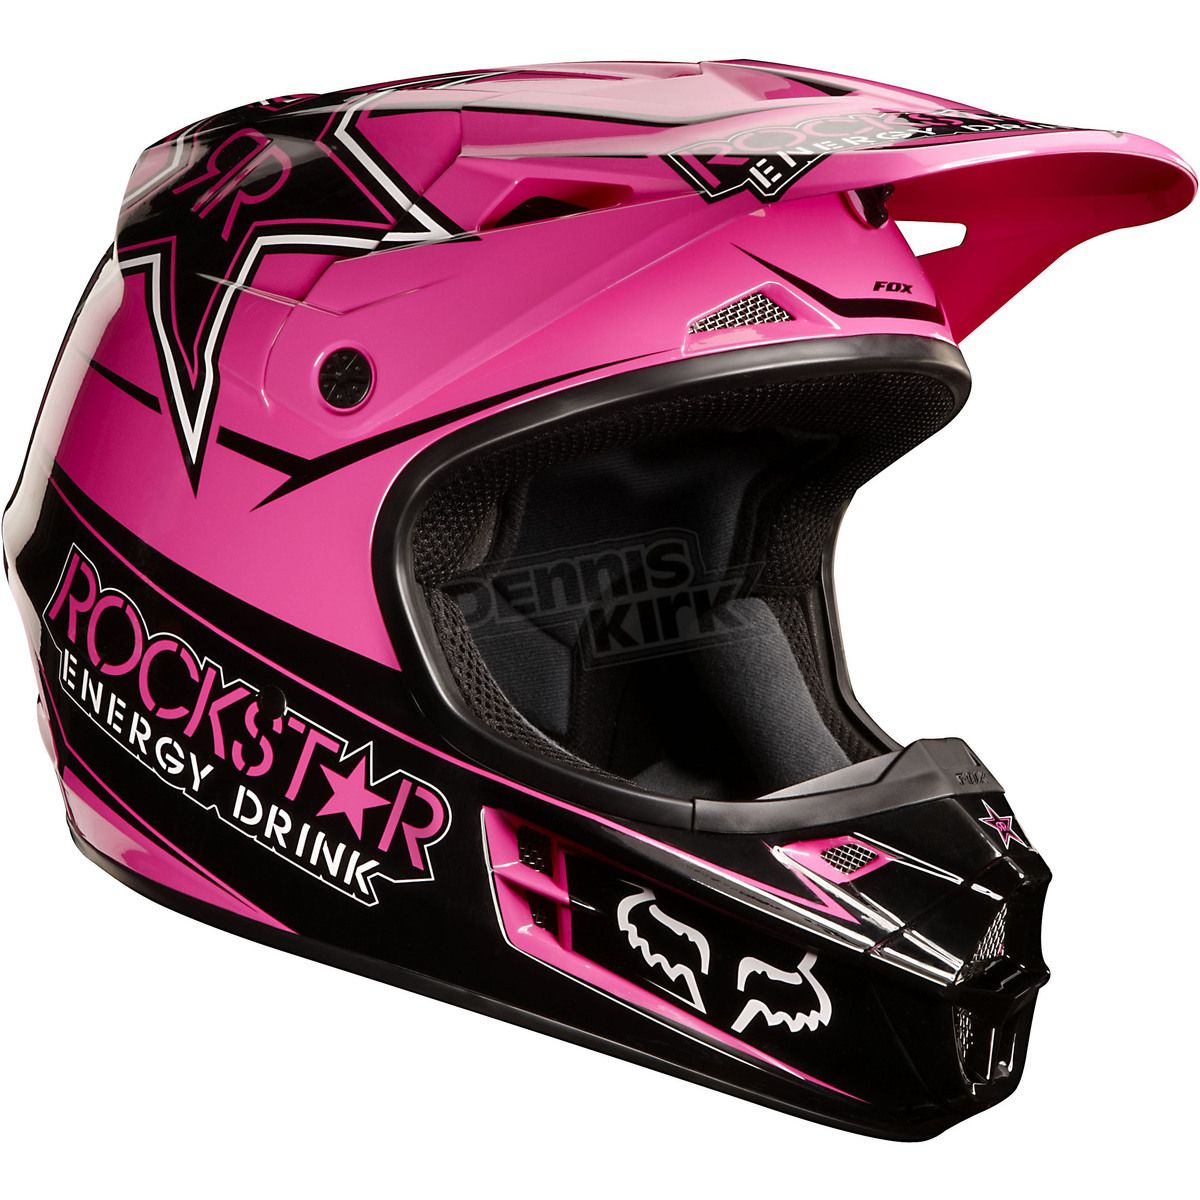 Pink Rockstar Fox Racing Helmet Motocross Helmets Dirt Bike Girl Bikes Girls